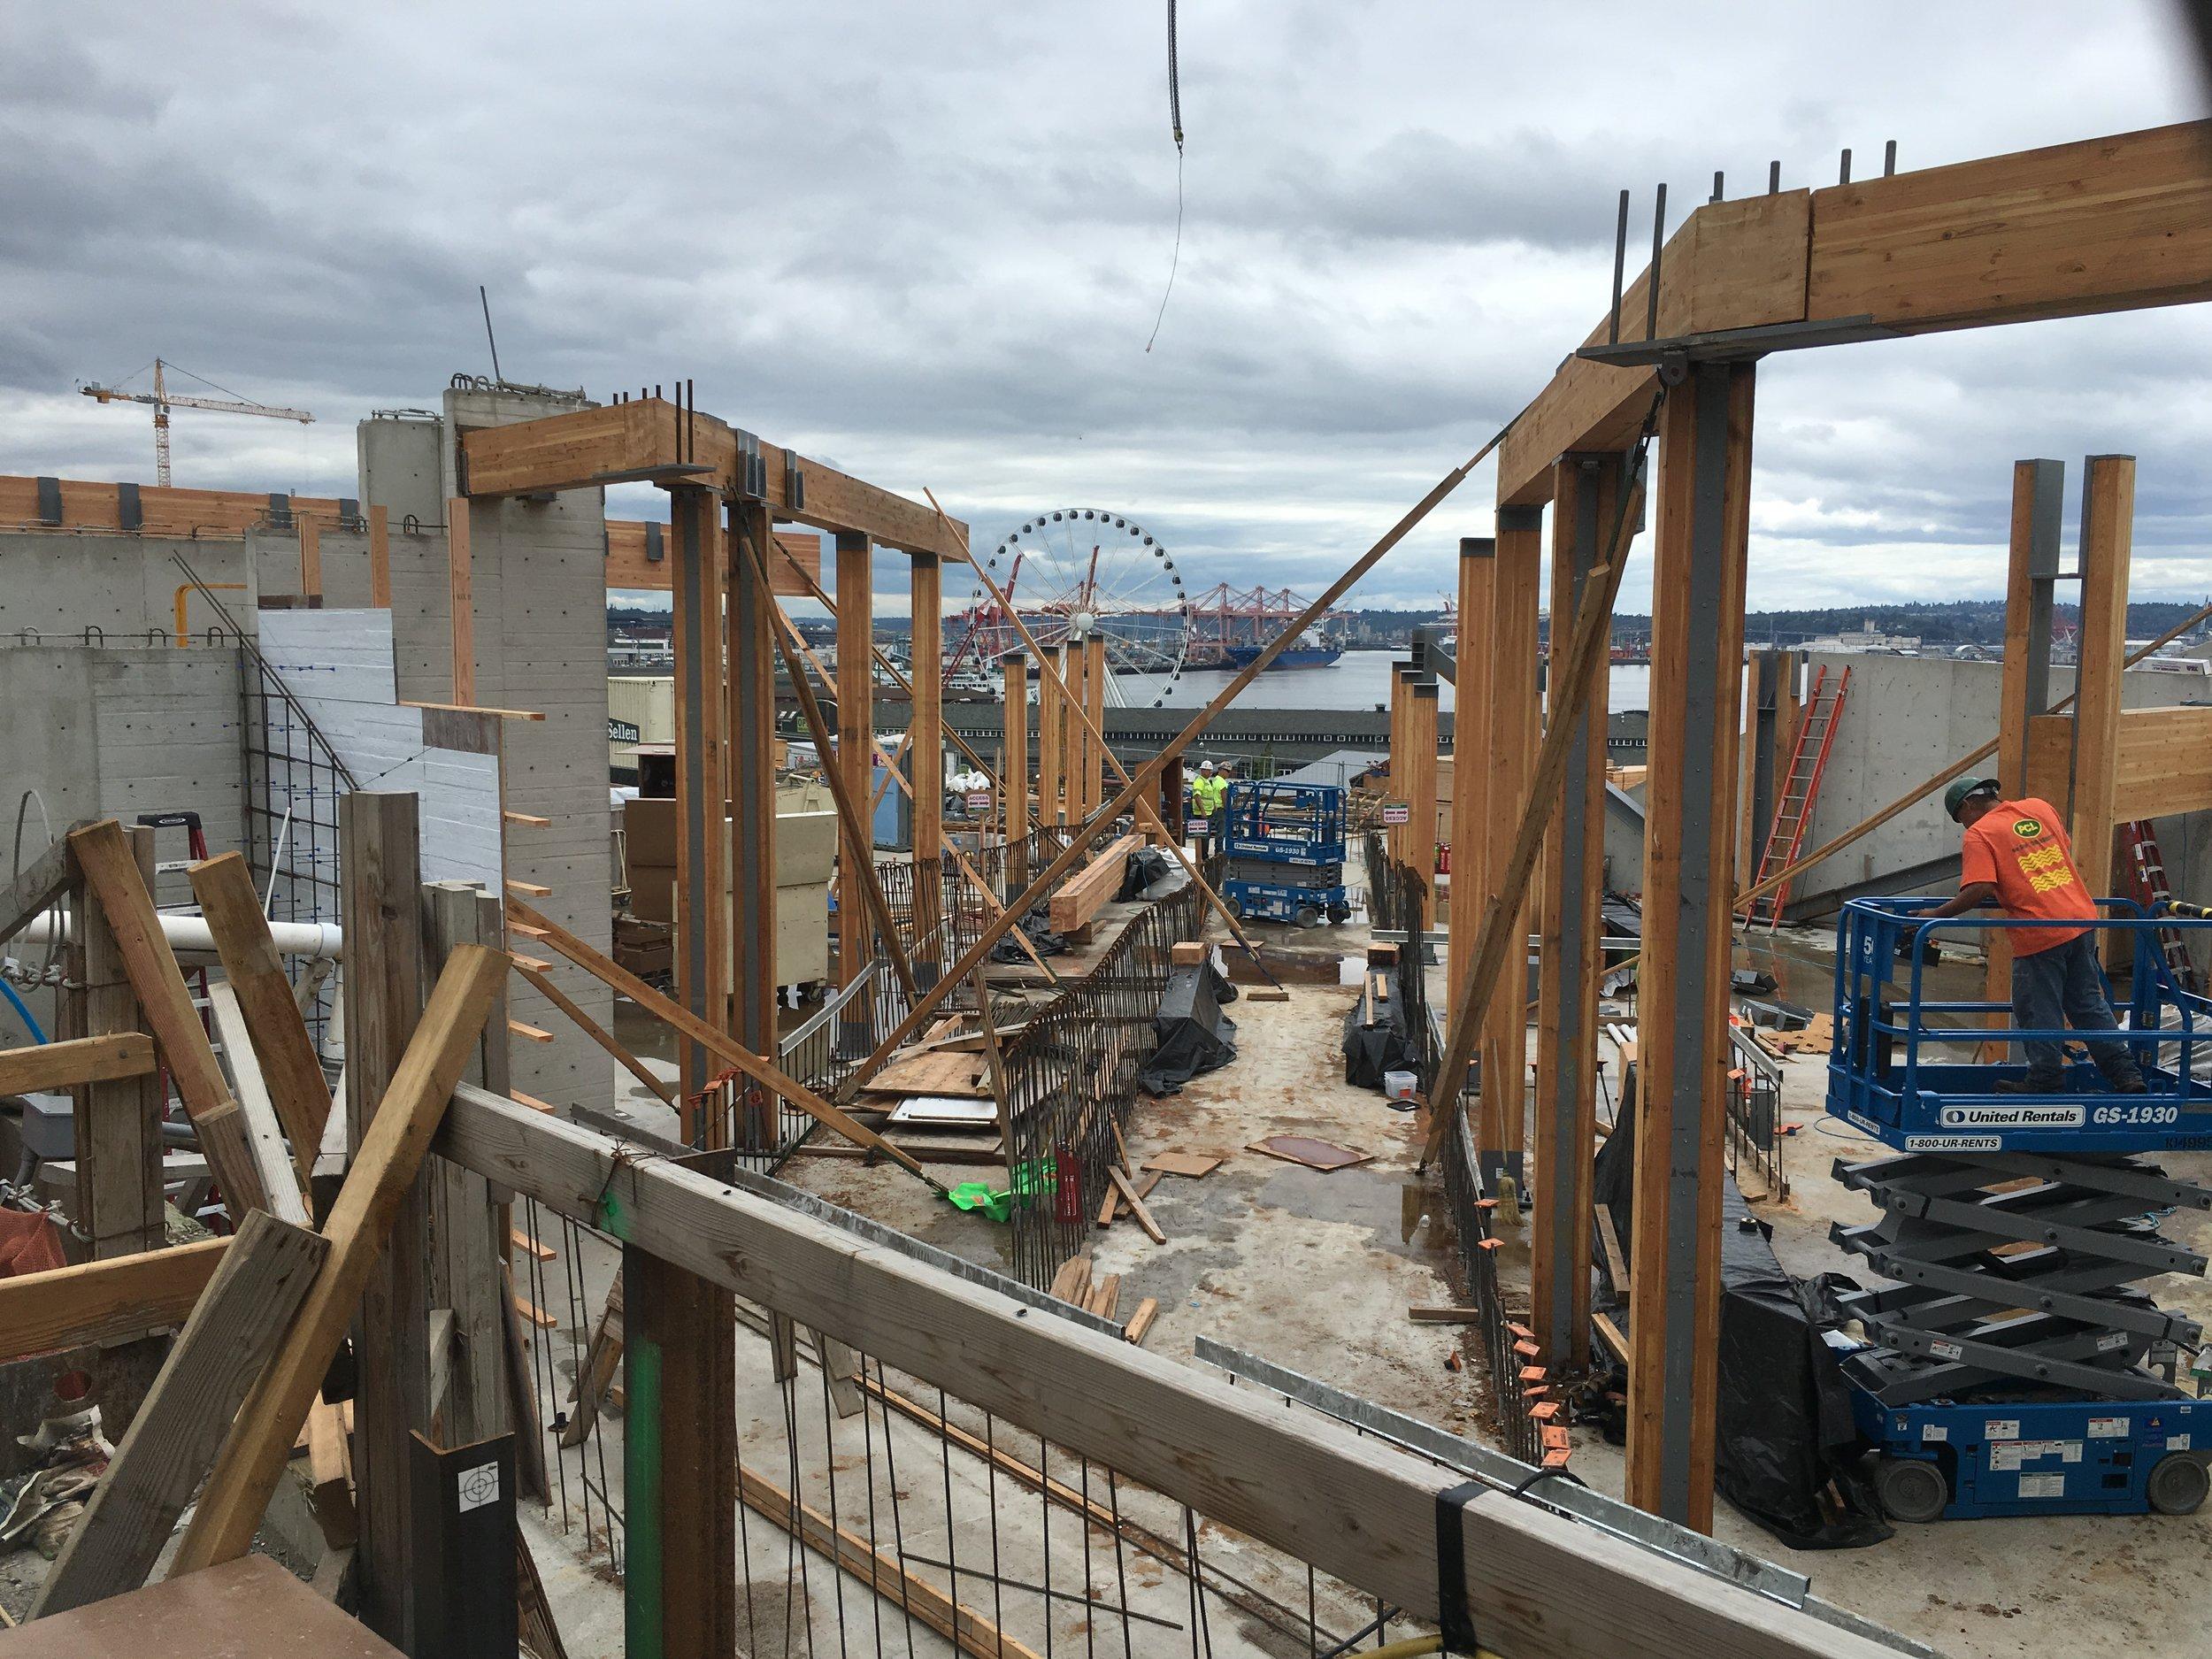 Pike Place Market Waterfront Entrance building under construction (looking Southwest)